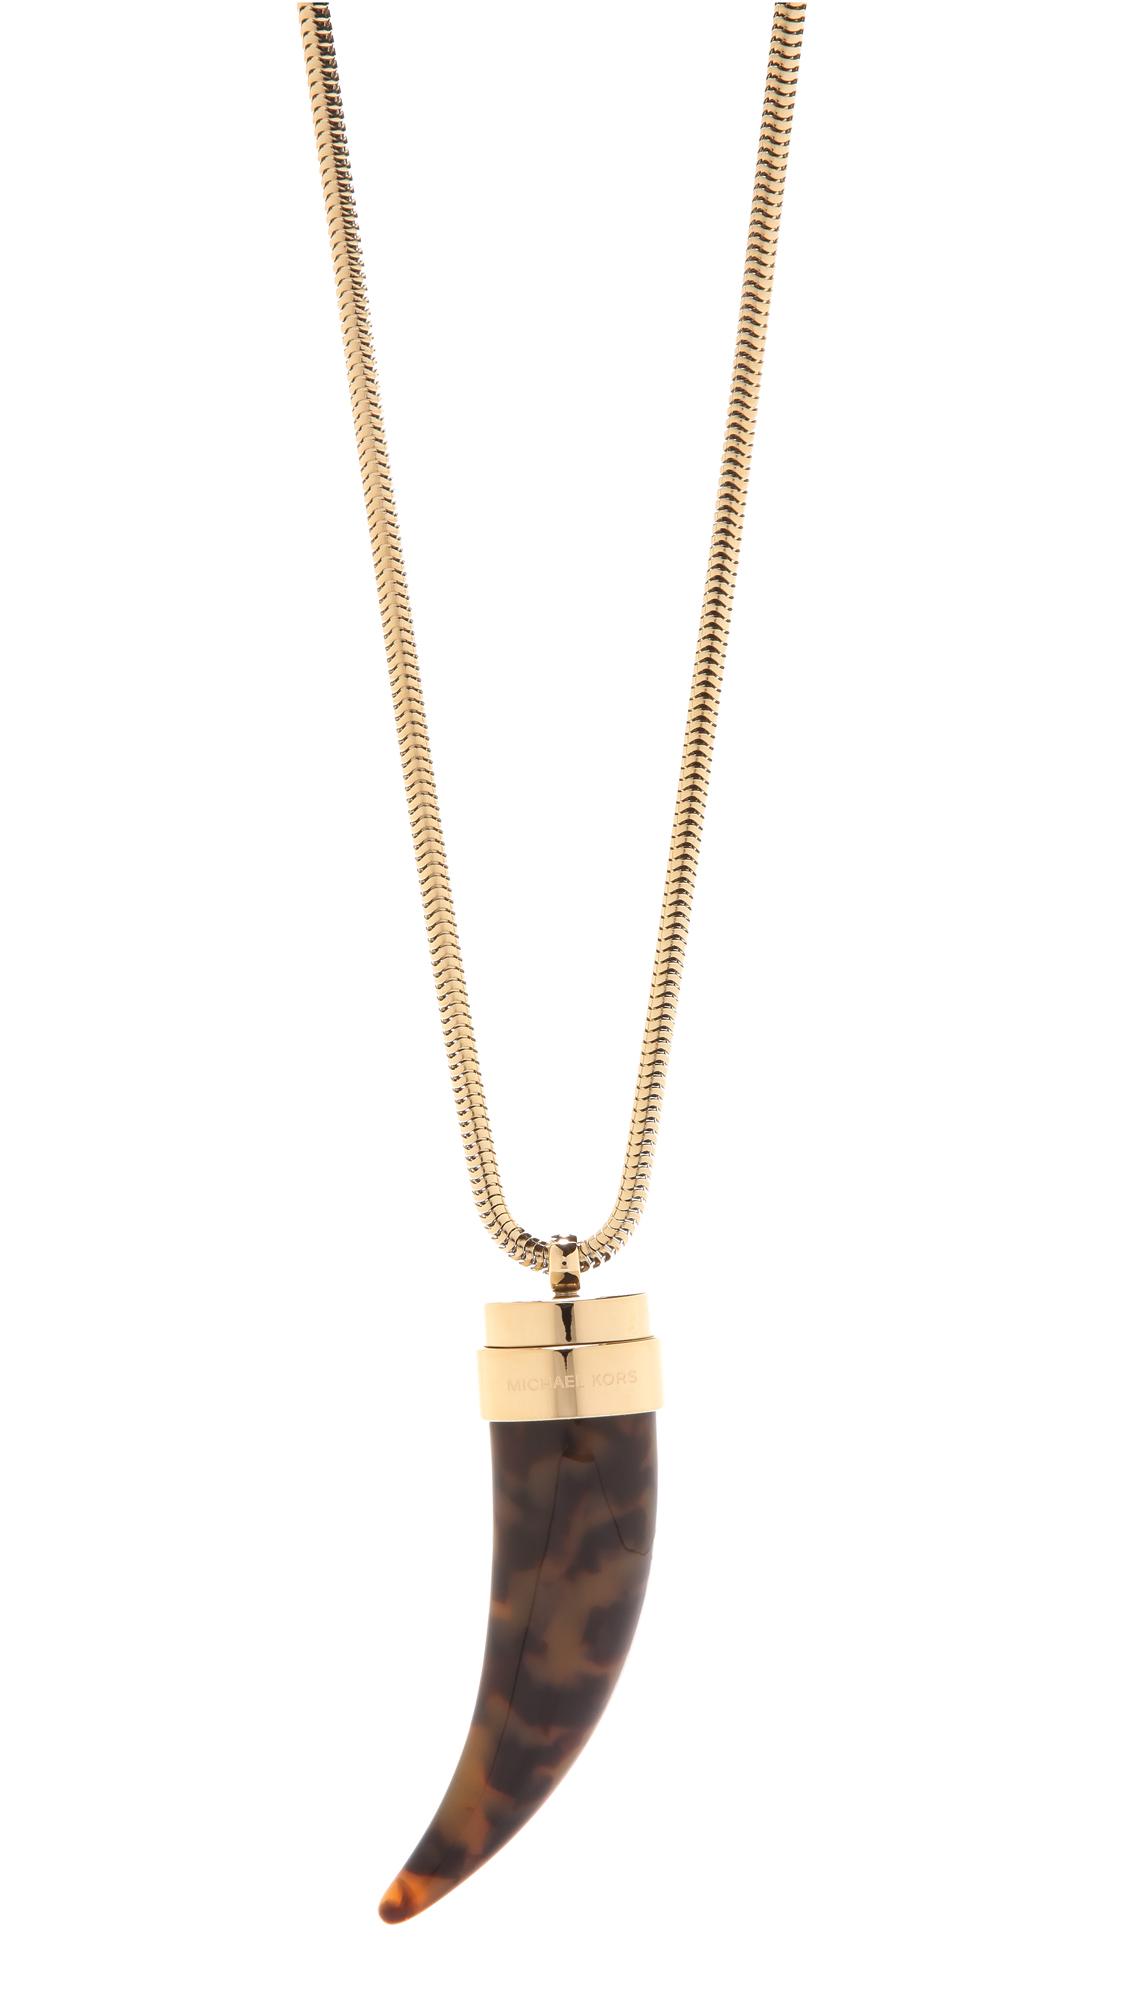 Michael kors tortoise horn pendant necklace shopbop mozeypictures Image collections